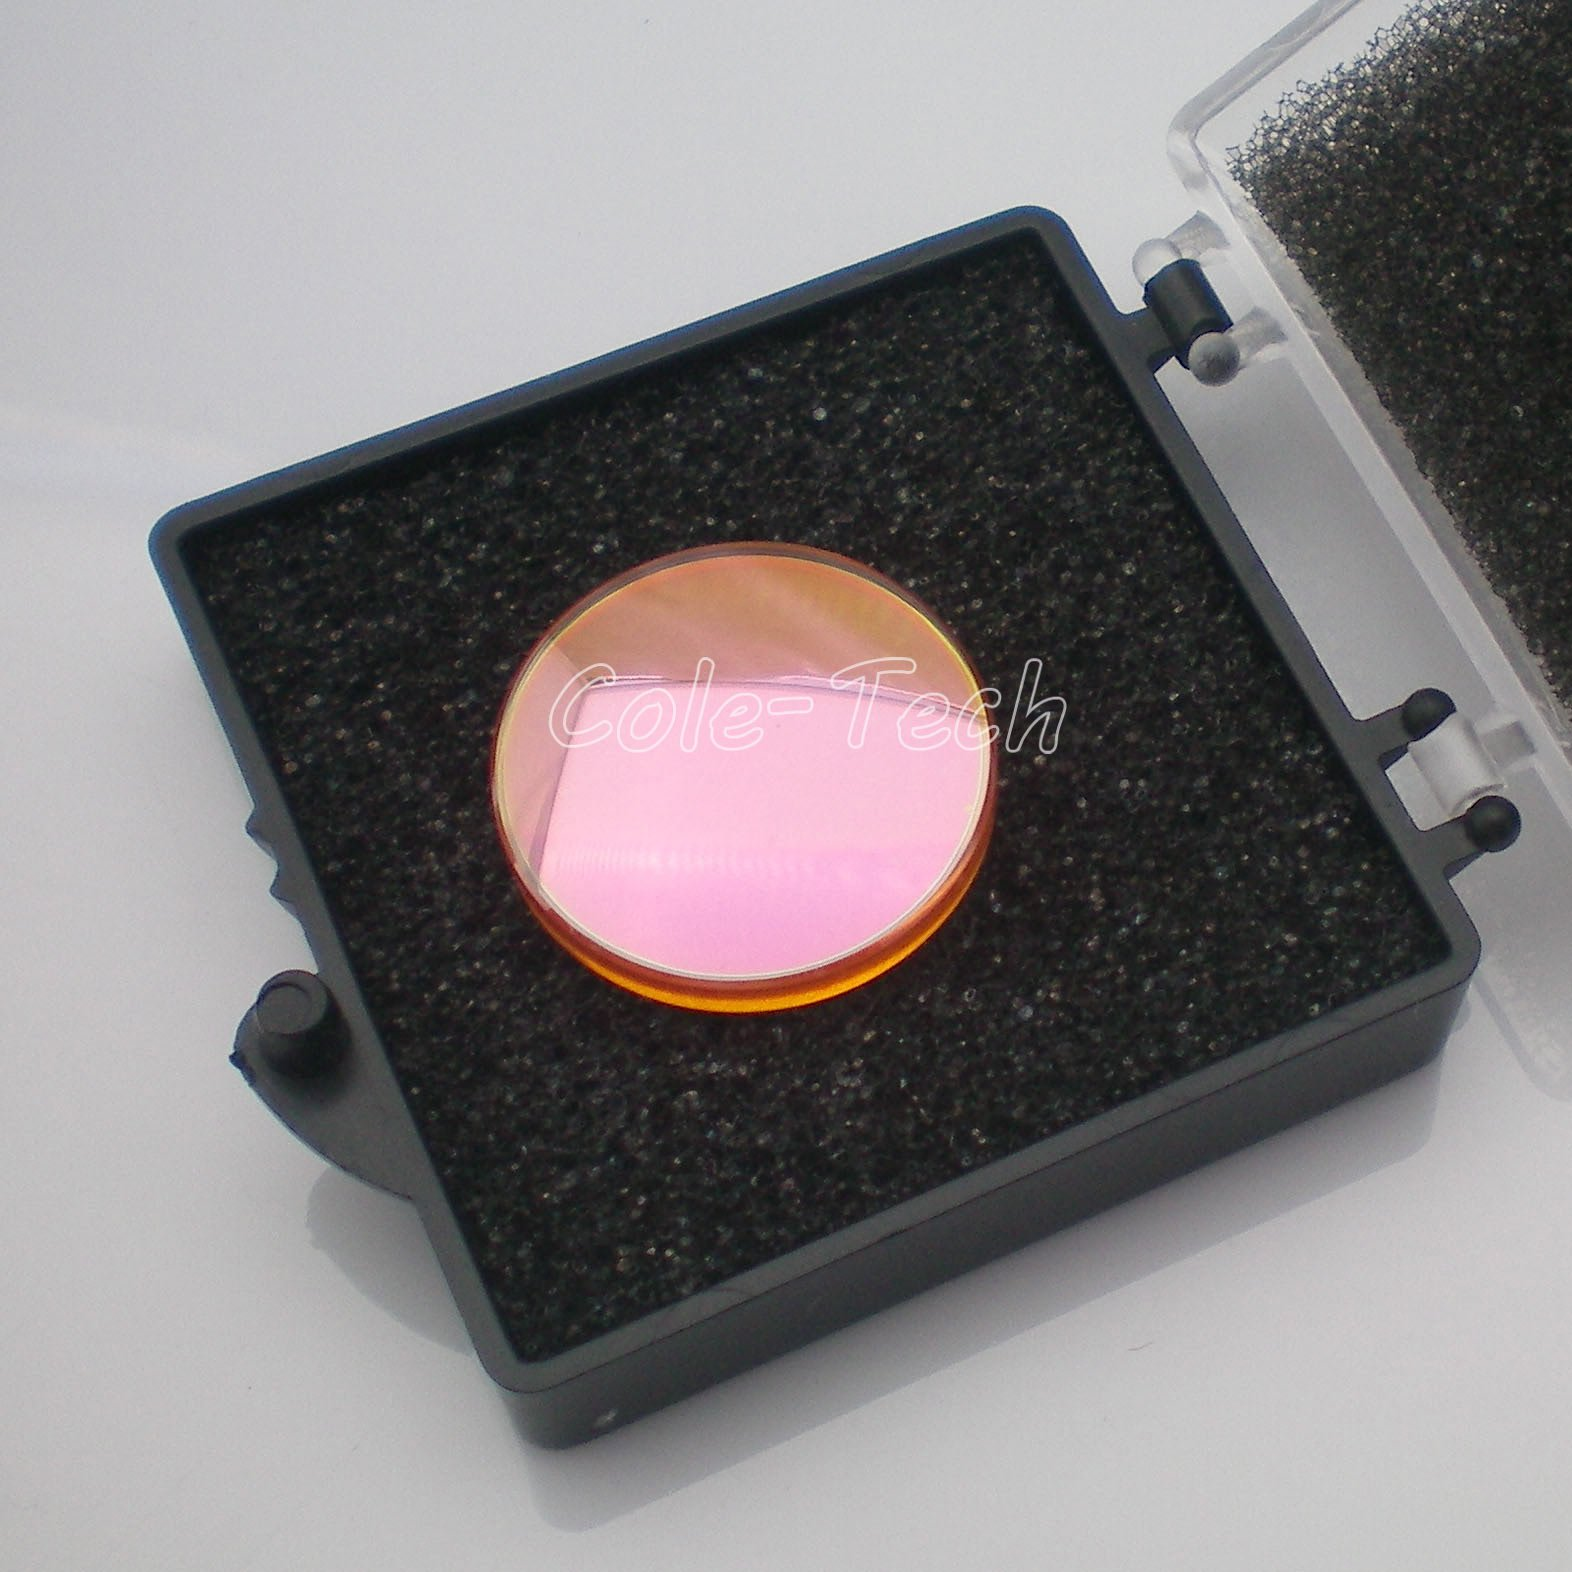 18mm ZnSe Focus Lens for CO2 10600nm 10.6um Laser Engraver/Cutter Dia:18mm FL: 3'' or 76.2mm